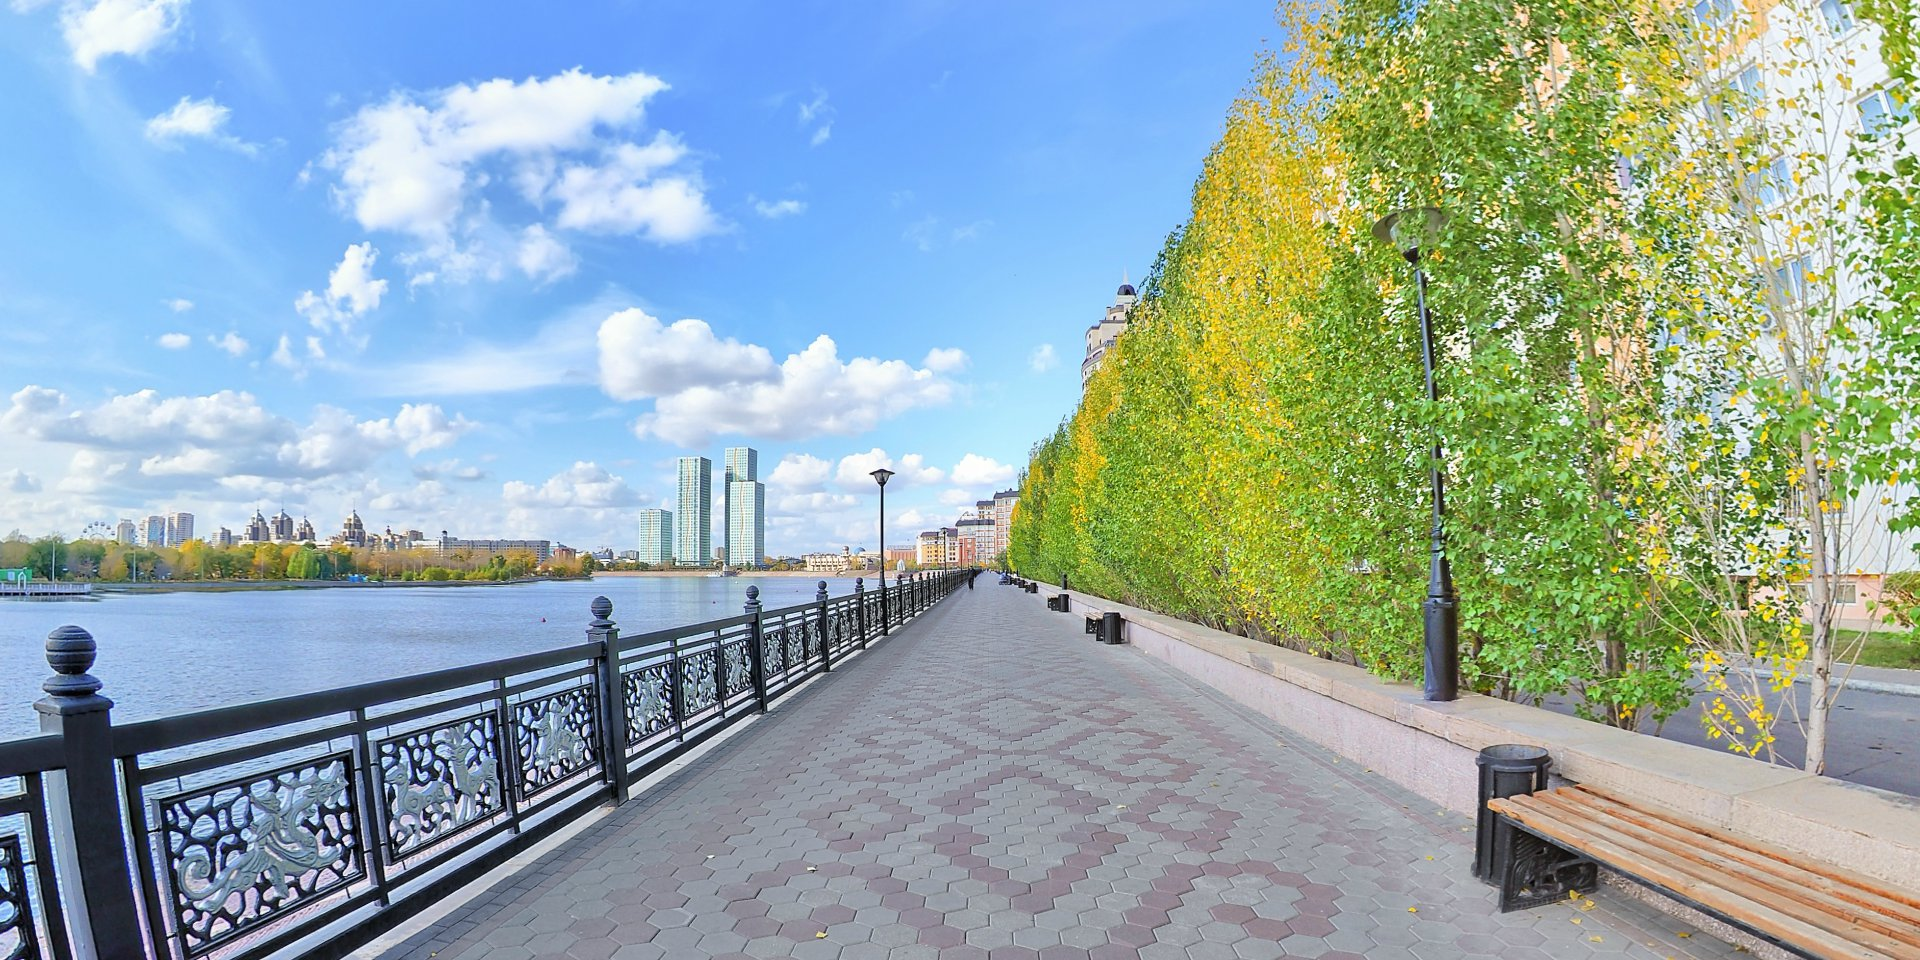 Астана впервые на Google Street View